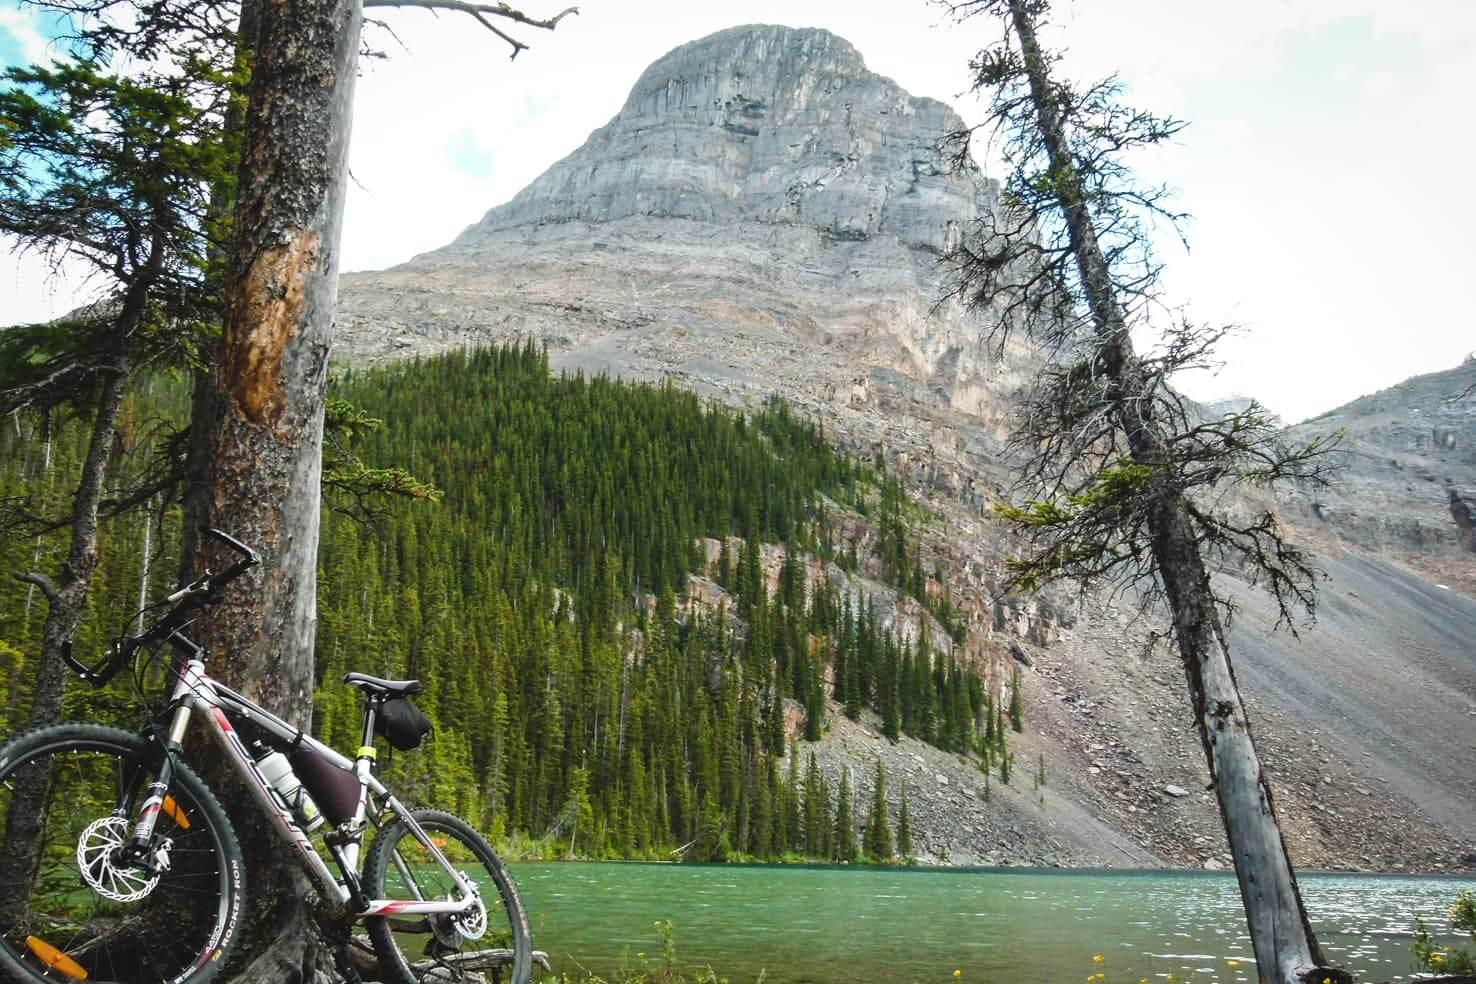 Adventure travel guide to Yoho National Park - mountain biking to Ross Lake